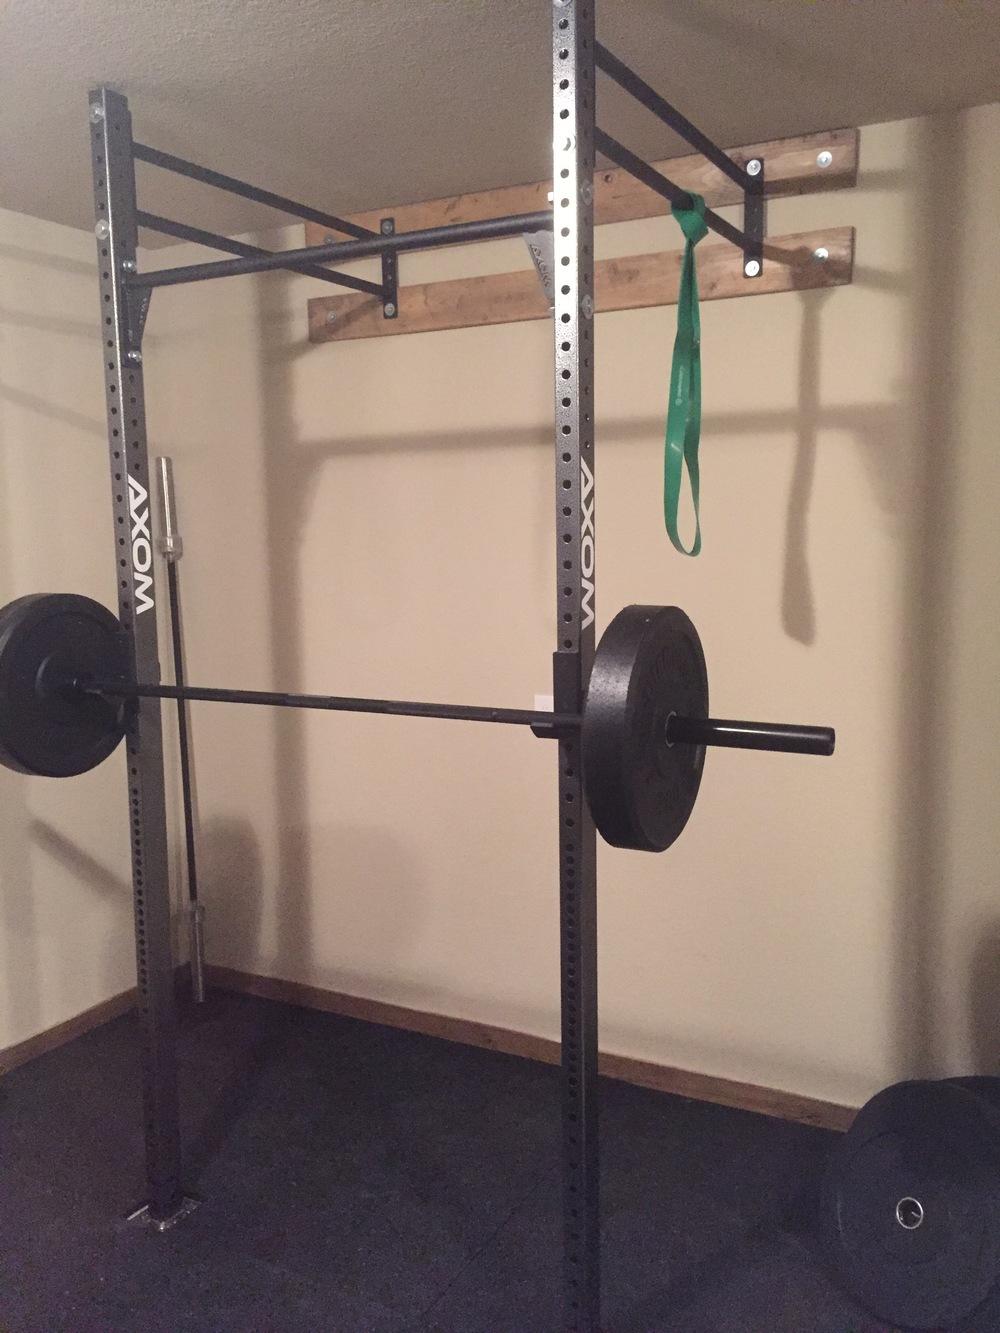 Folding squat rack i foldable for garage picture of u neace